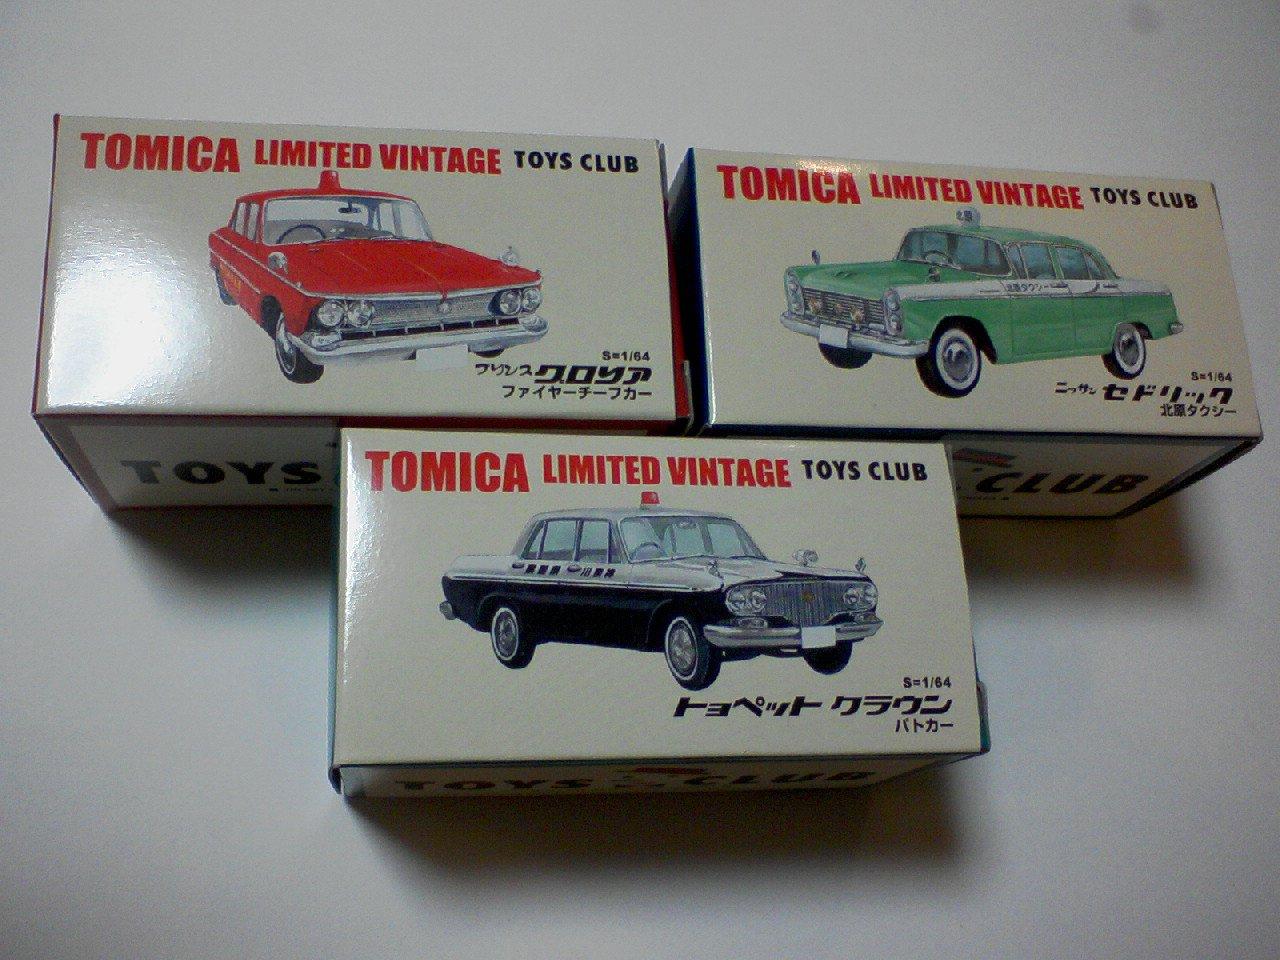 TOYS CLUB トミカリミテッド第1弾 クラウンパトカー、セドリックファイヤーチーフカー、セドリック北原タクシー3種 B0080W3G5Q